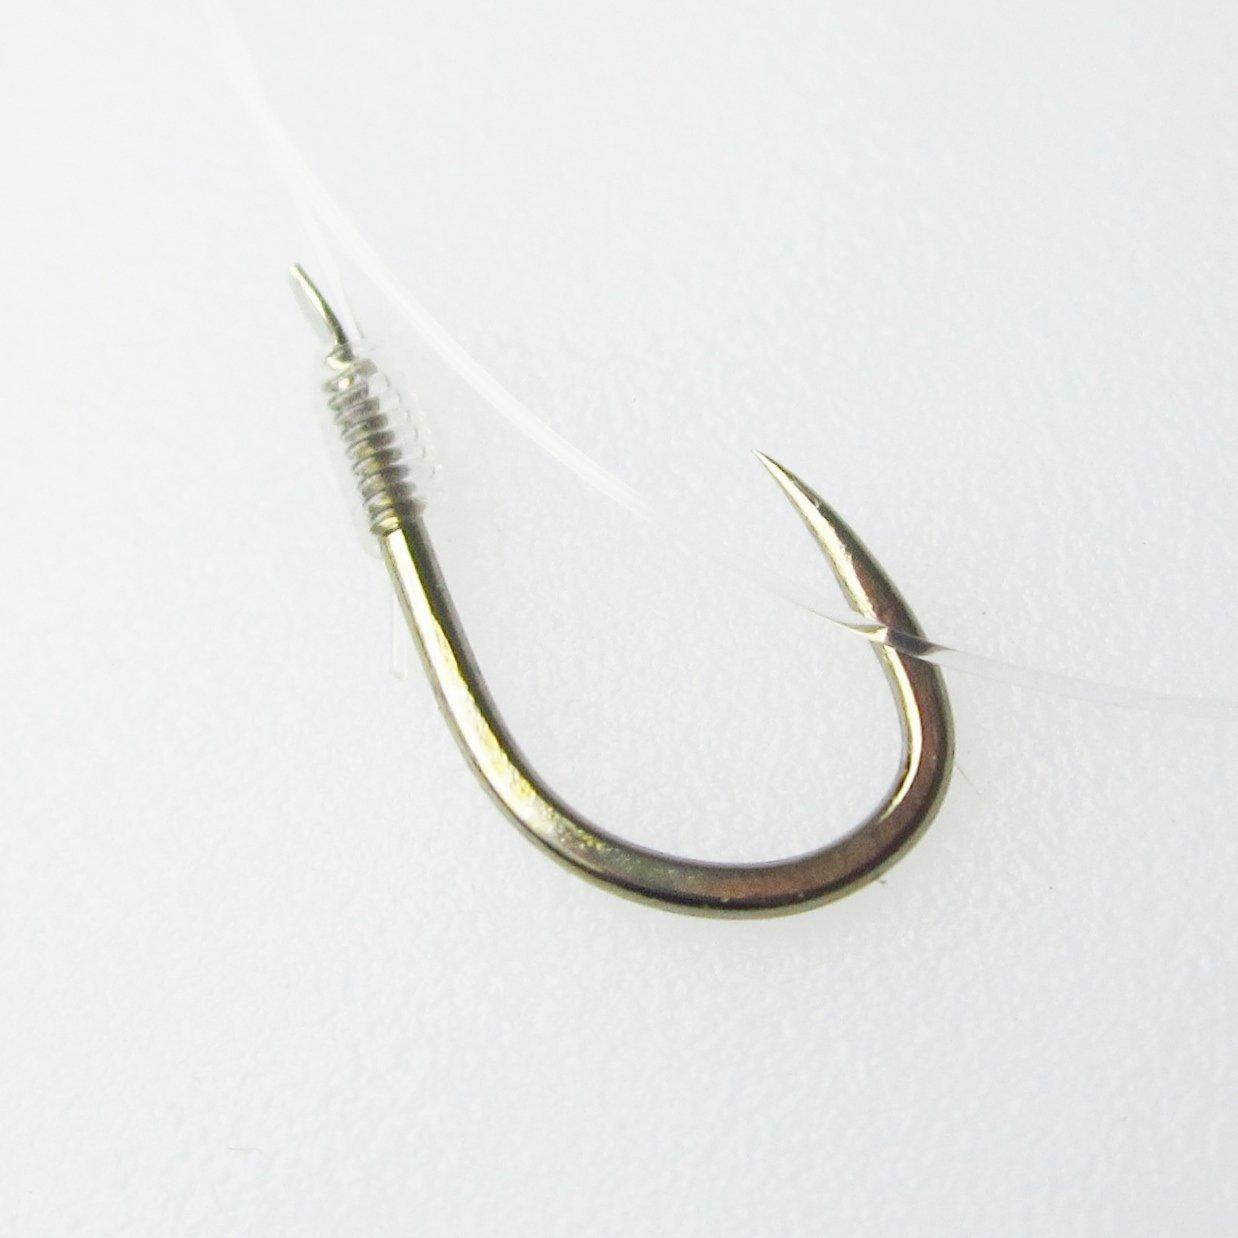 Drennan Barbless Margin Carp Hook to Nylon Sizes 8 /& 16 8 Pcs